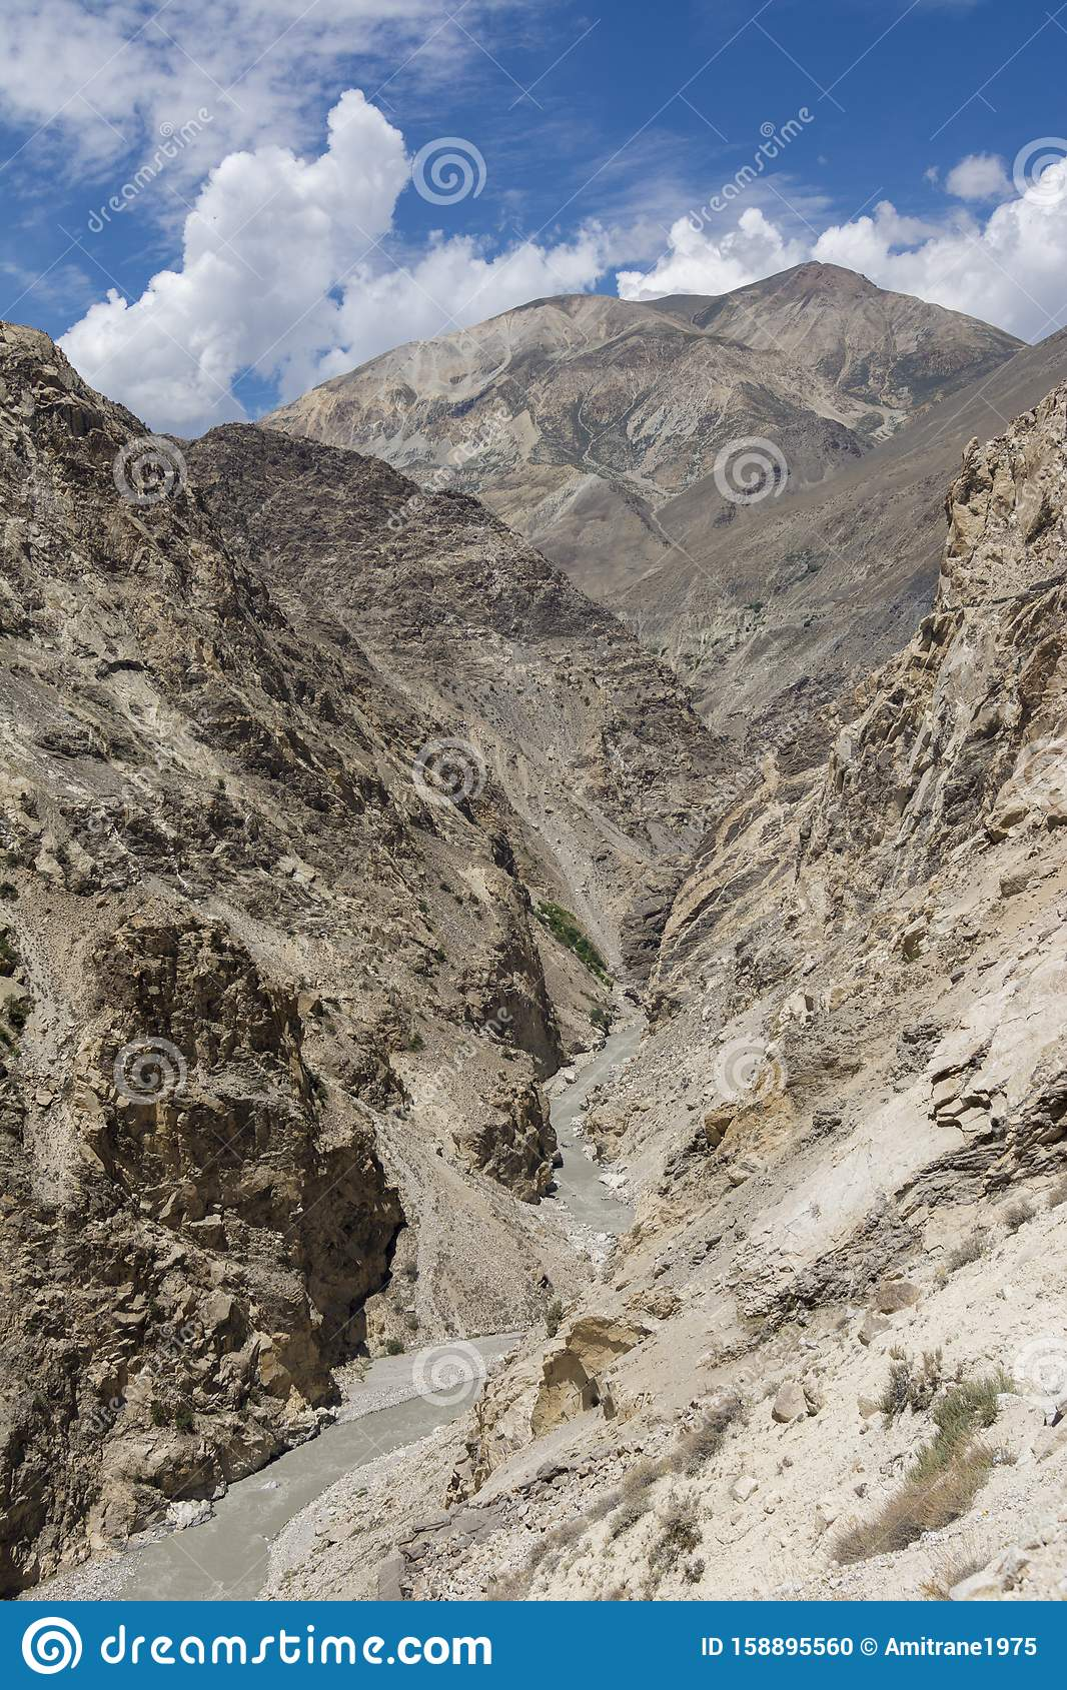 Dangerous Roads of Kinnaur in Himachal Pradesh,India